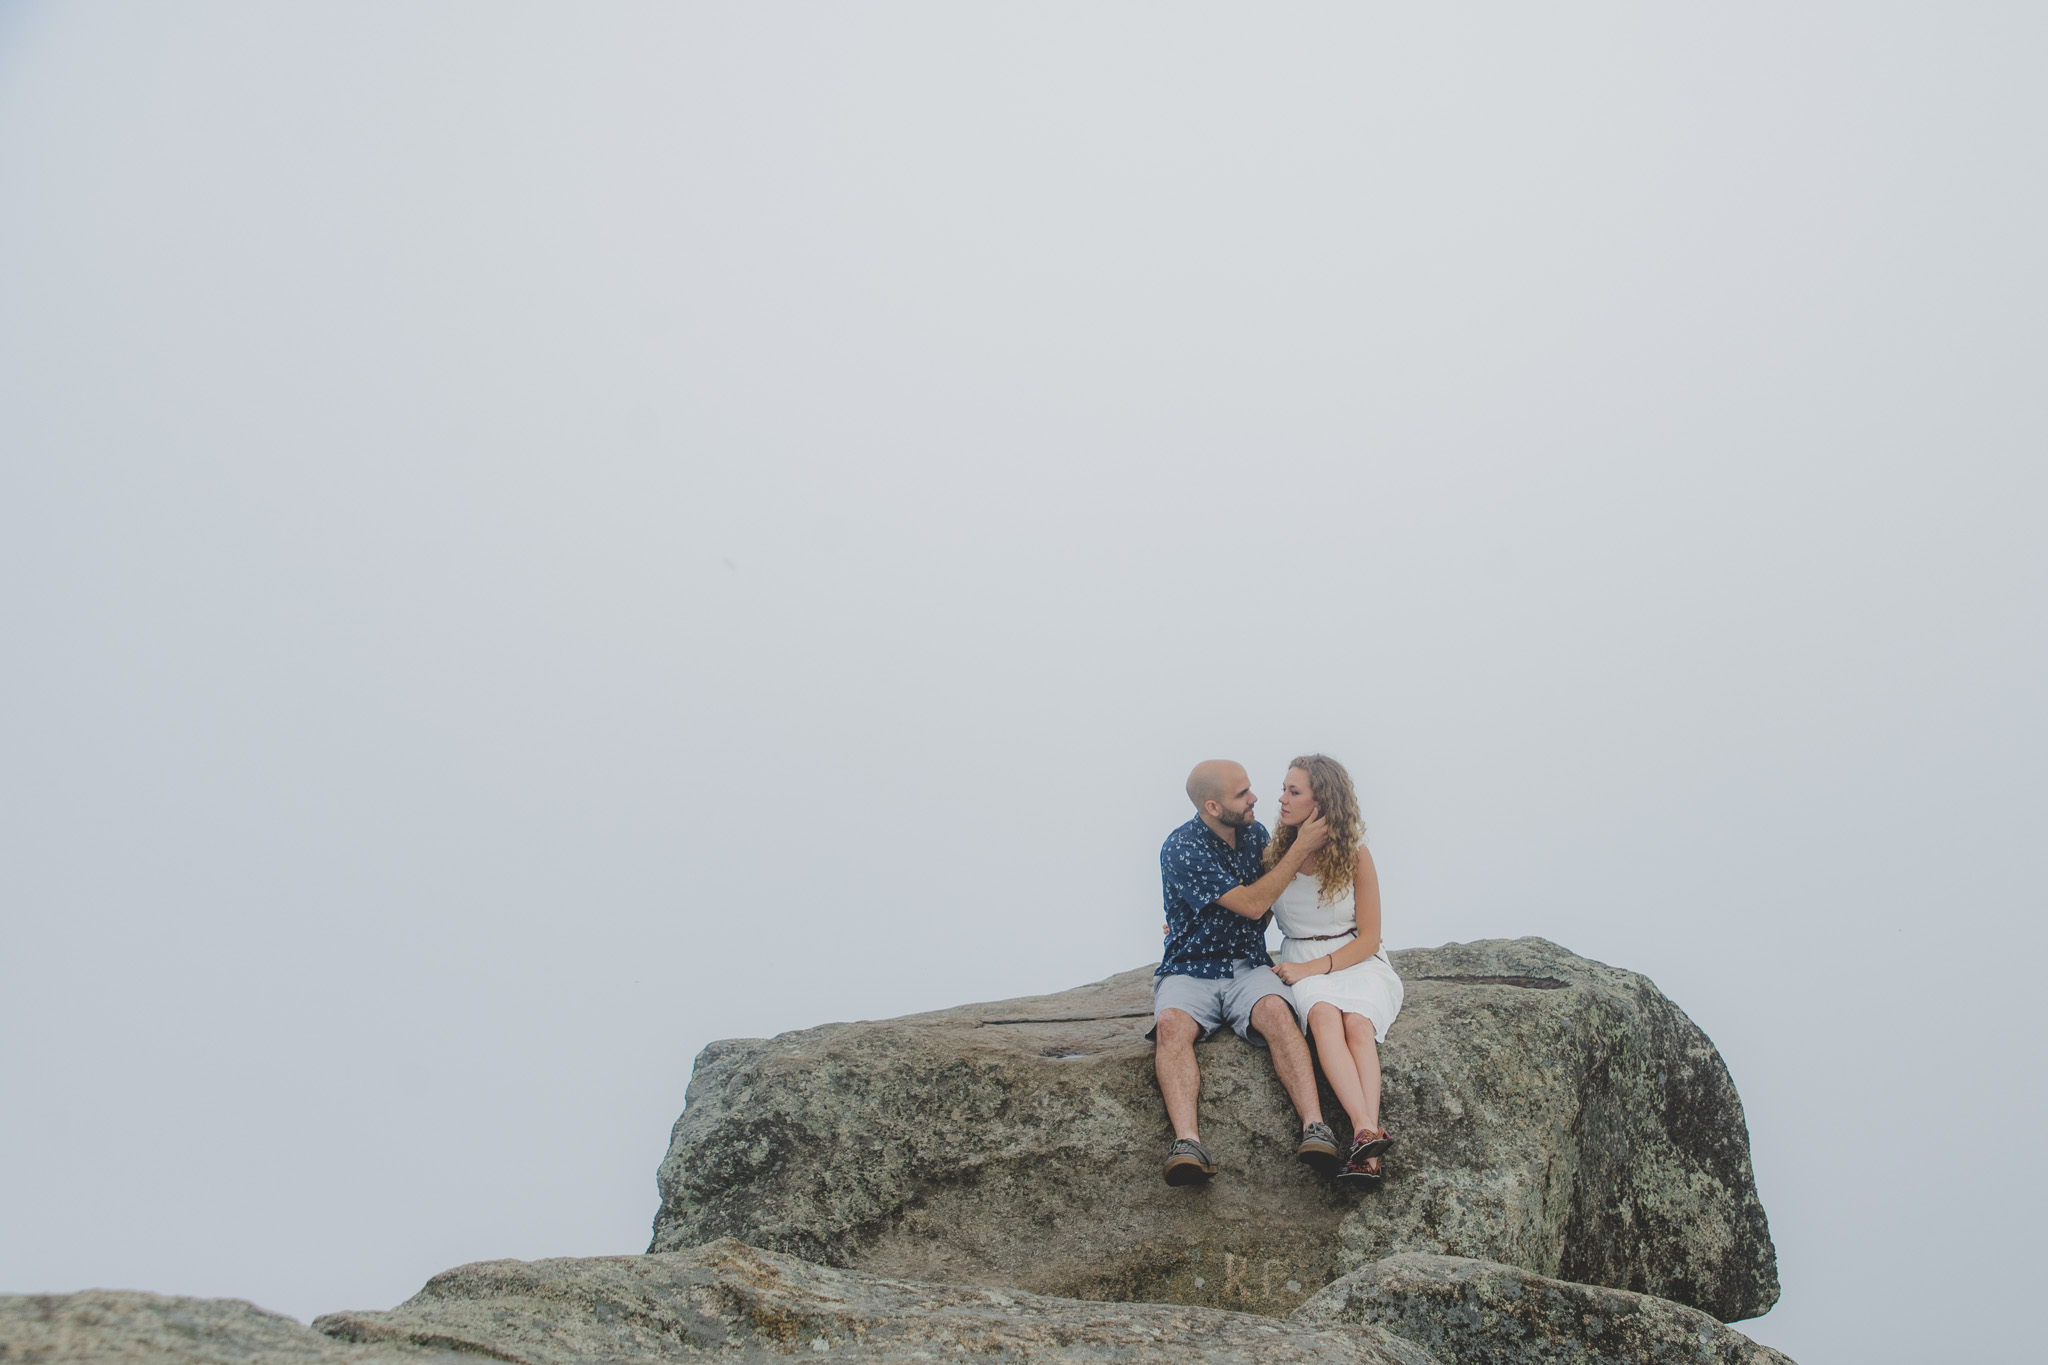 Sharptop_Mountain_Blue_Ridge_Mountains_Lynchburg_VA_1618.jpg